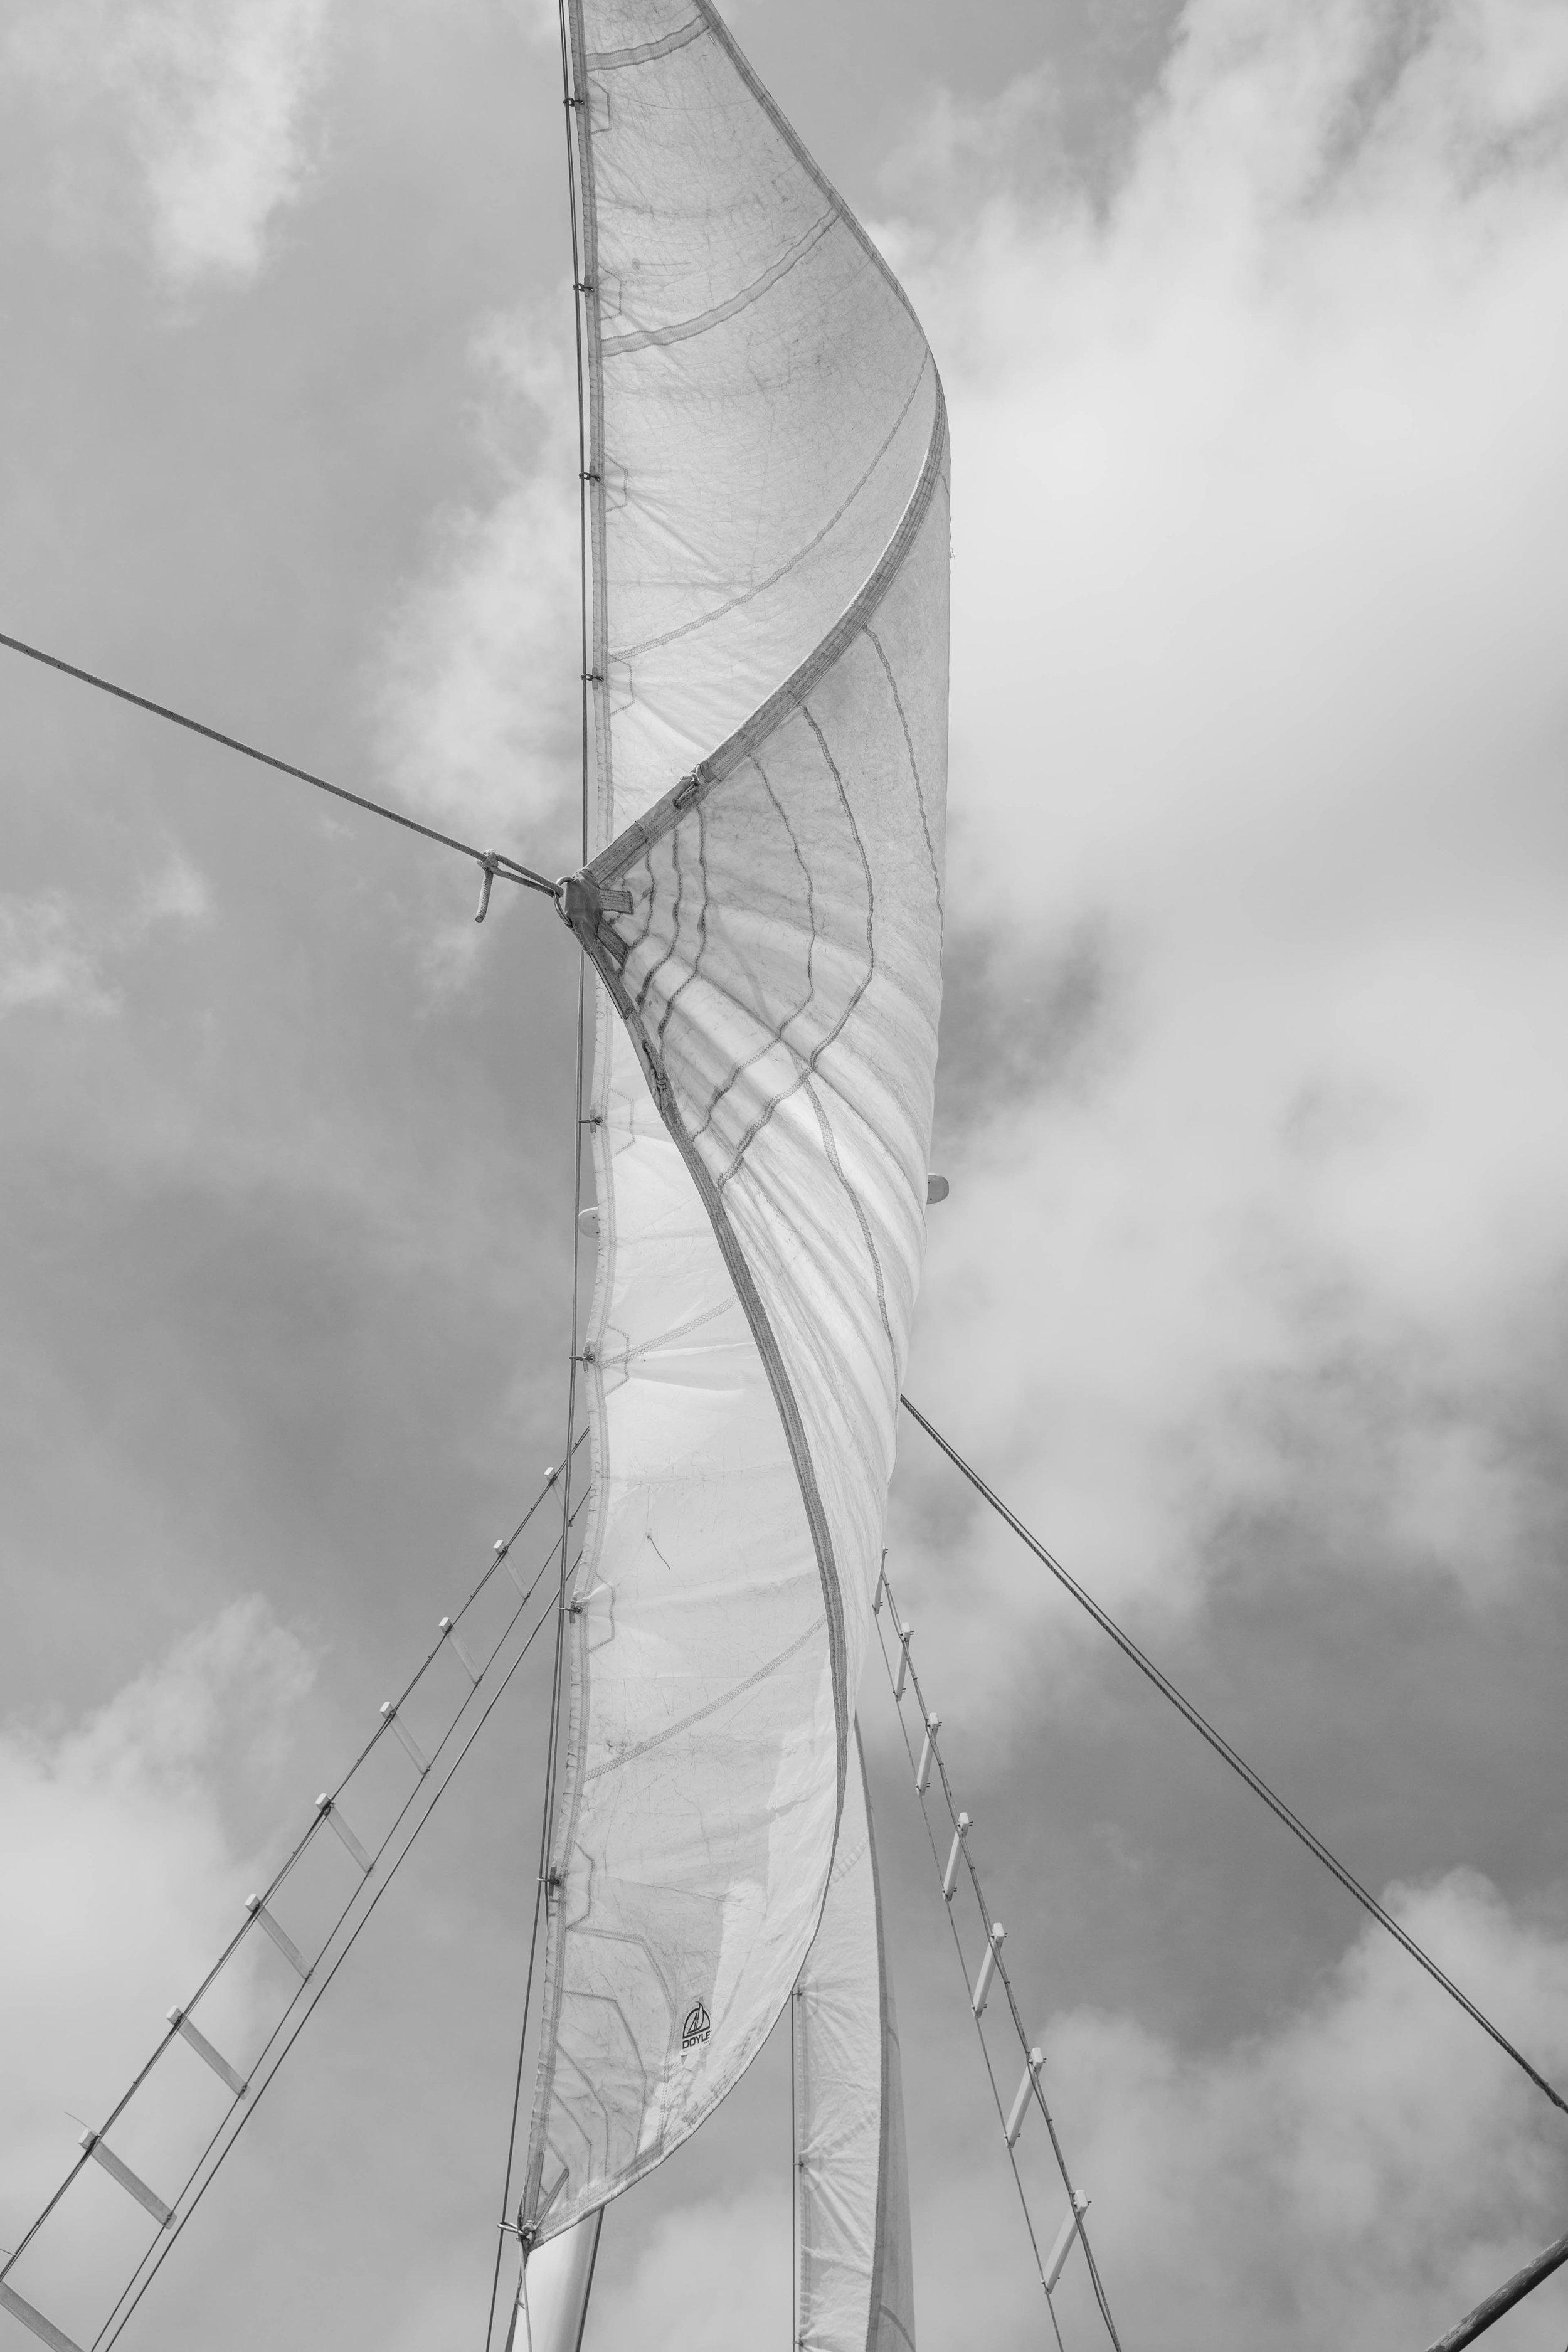 sails3new (1 of 1).jpg